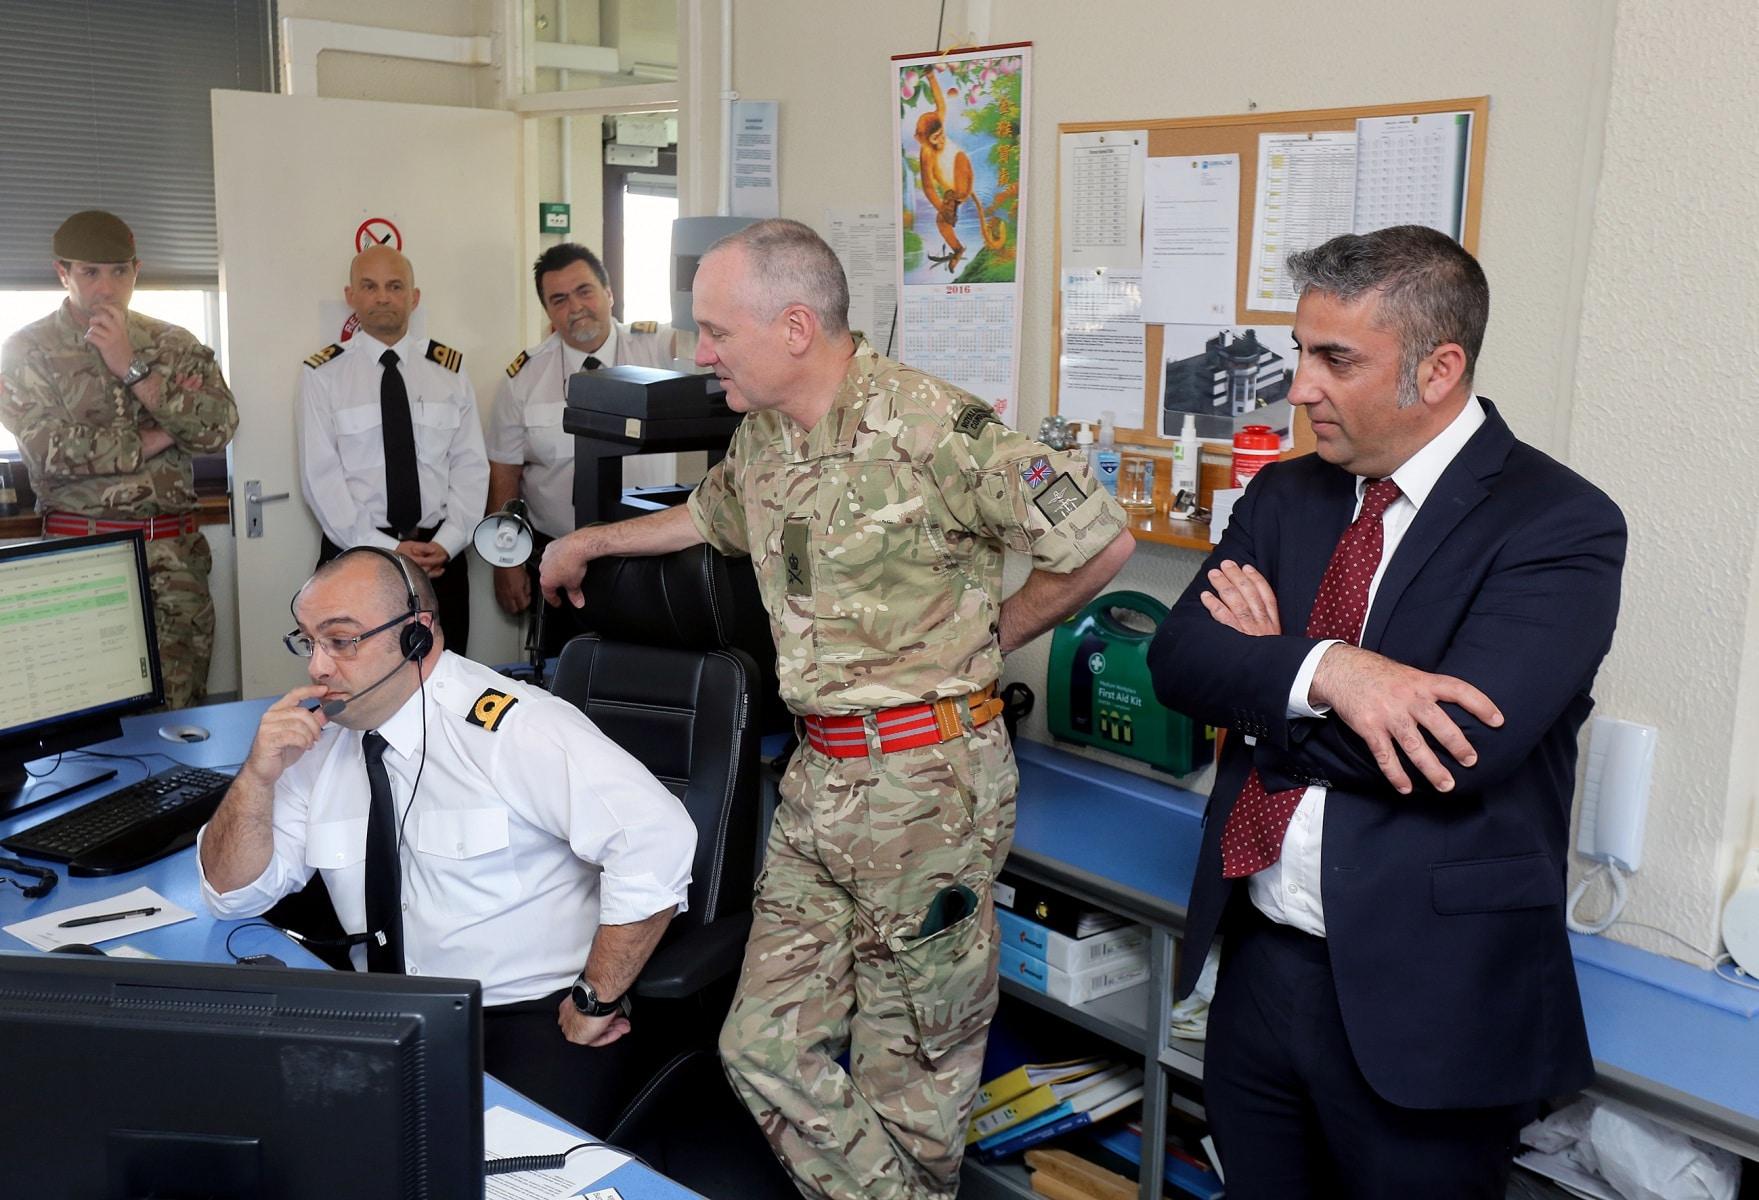 visita-oficial-del-gobernador-al-puerto-de-gibraltar_26128567376_o